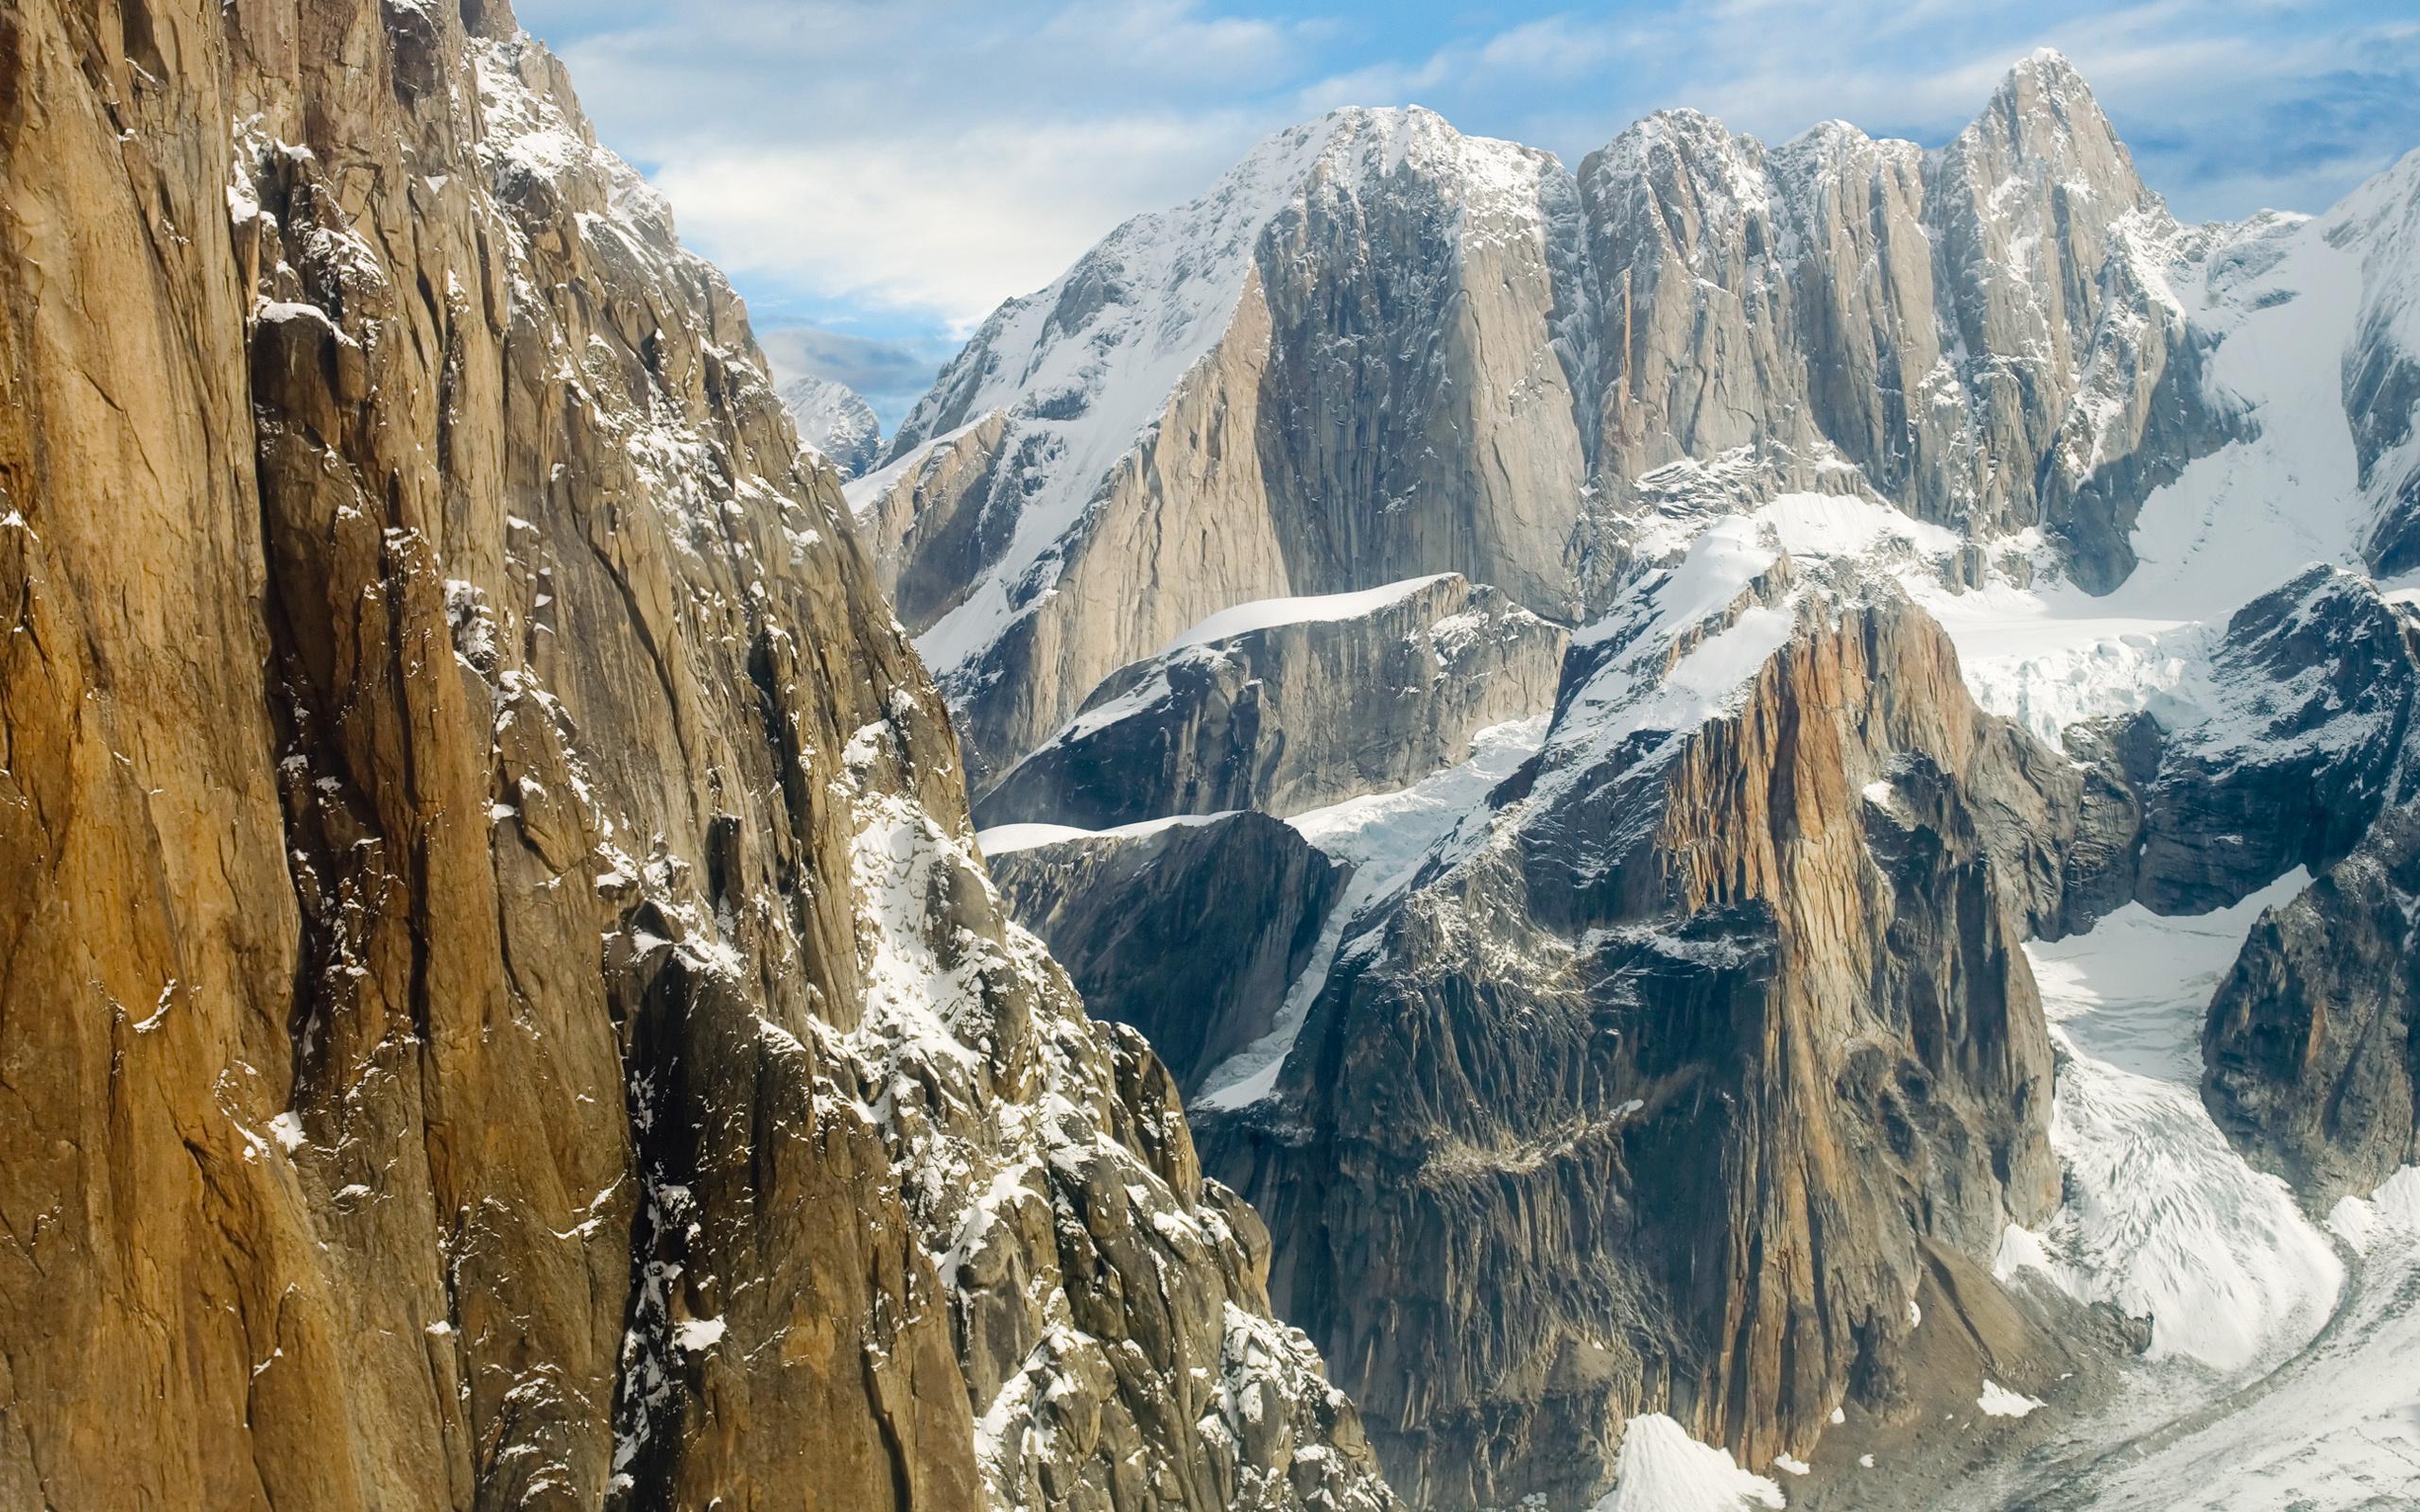 графика горы скалы снег зима рисунок graphics mountains rock snow winter figure бесплатно